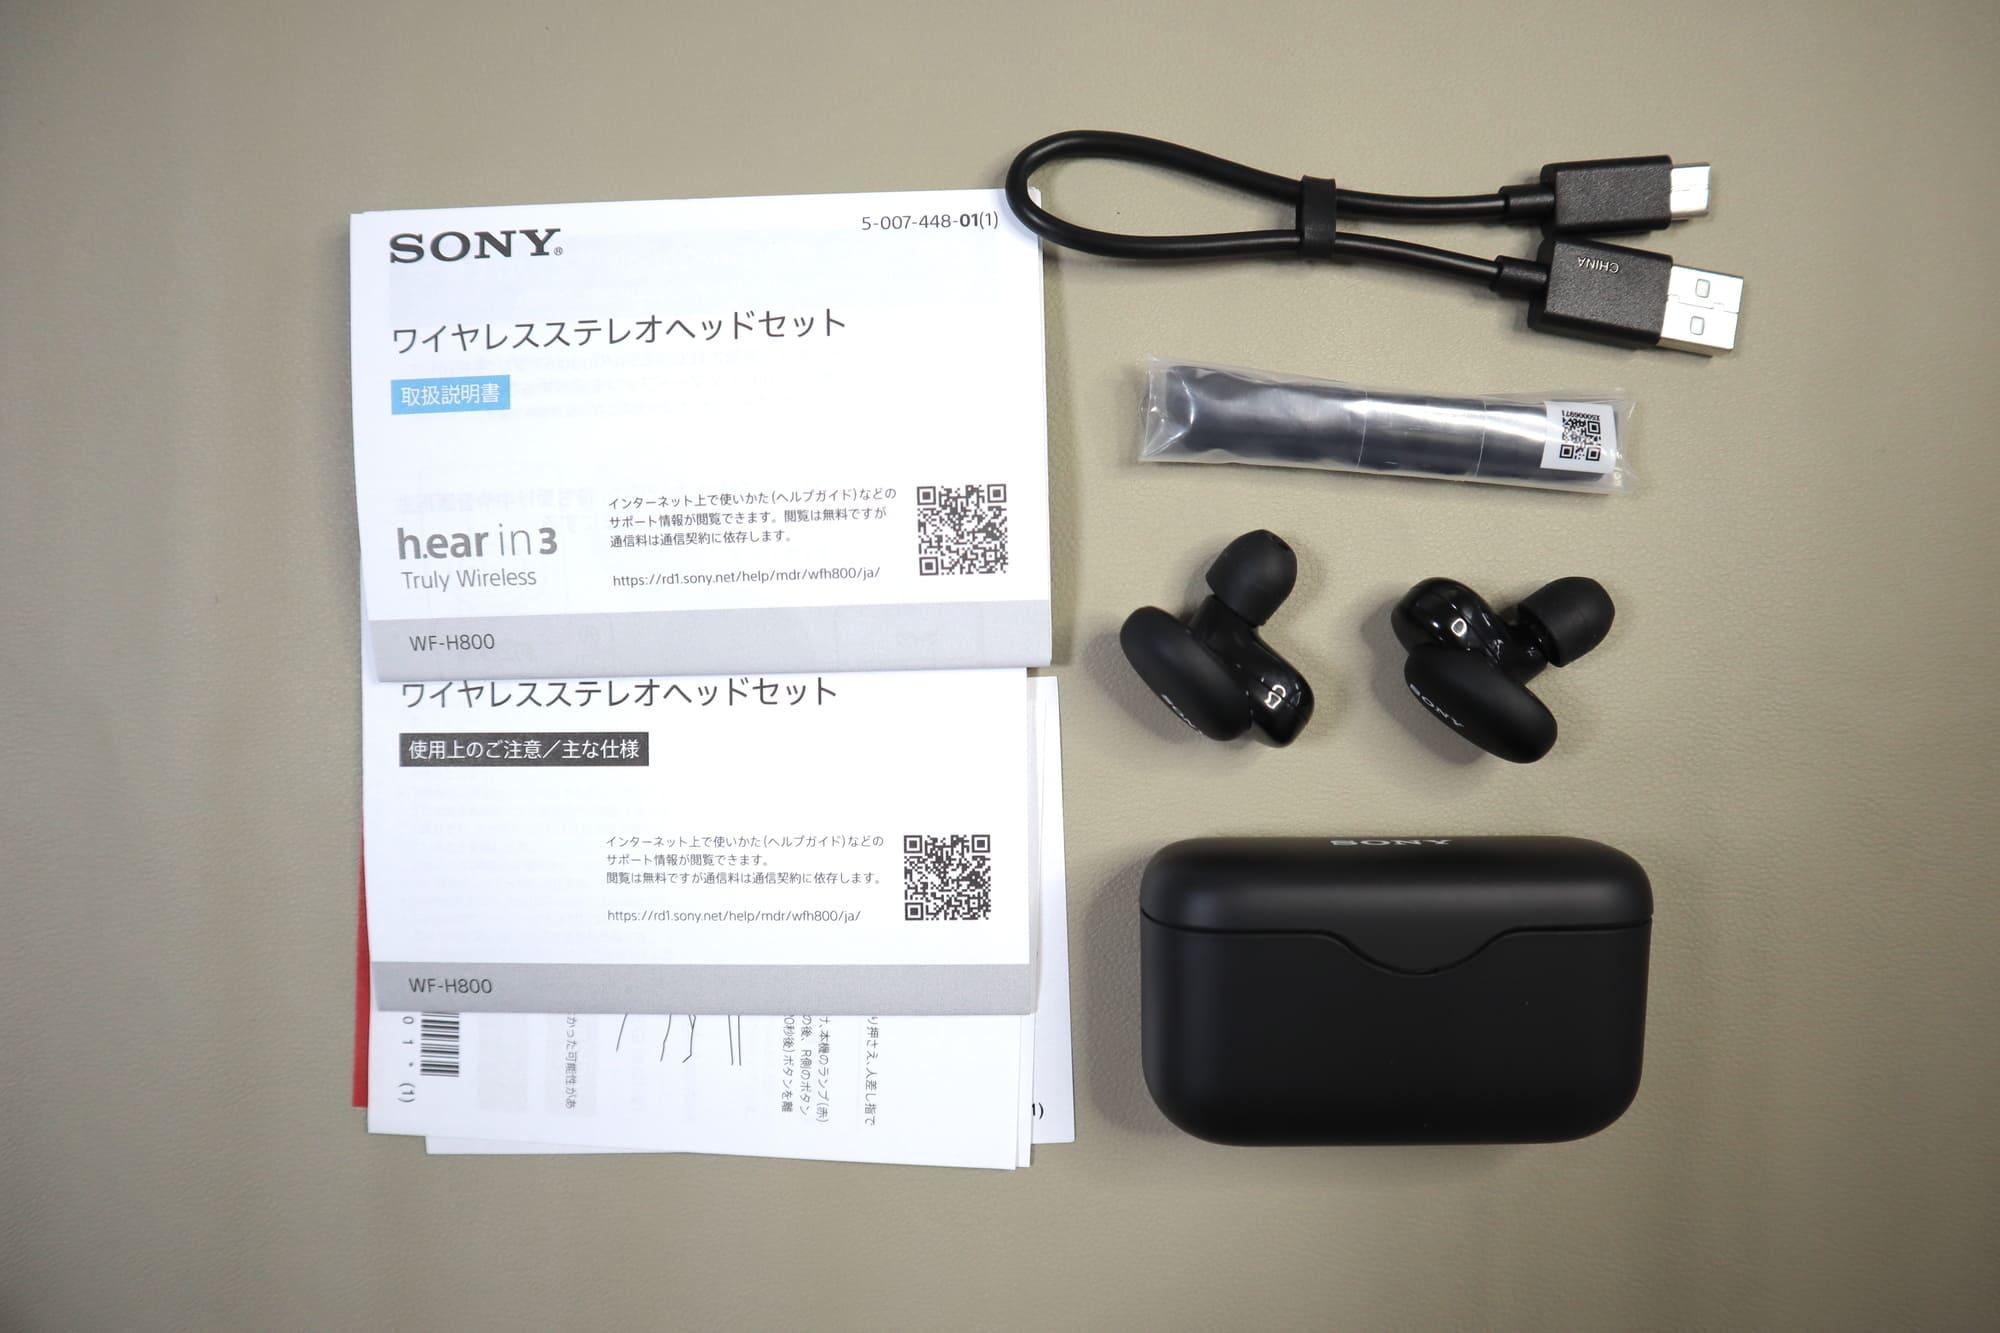 WF-H800の同梱品